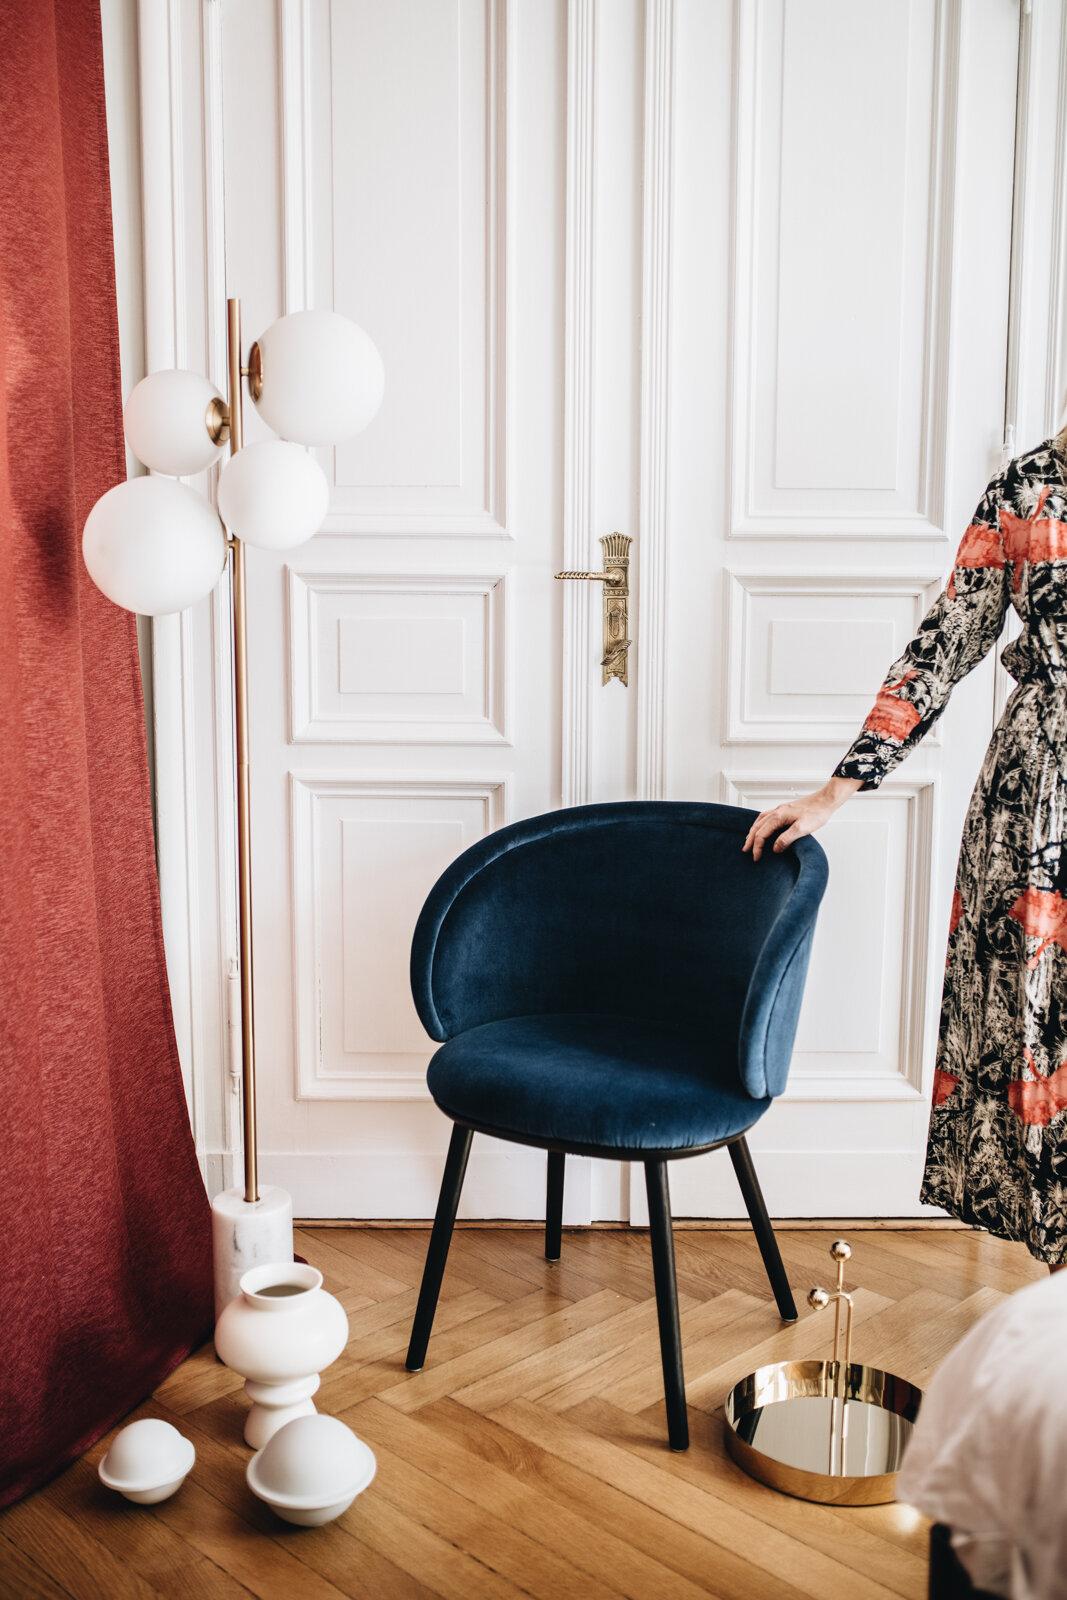 Setz dich - Ona Chair von Freifrau